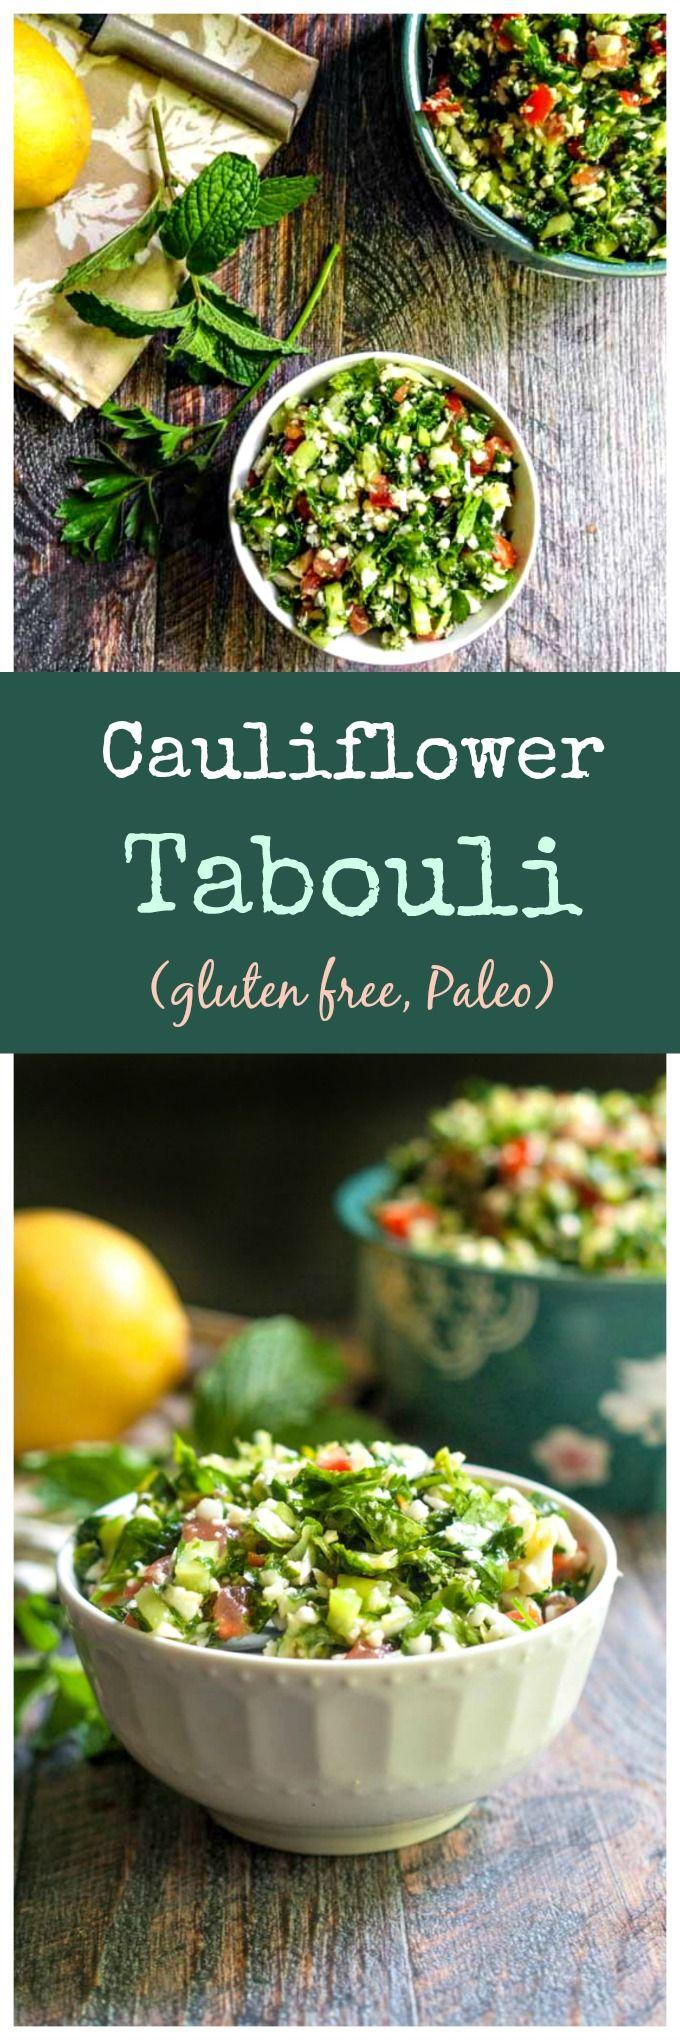 Cauliflower Tabouli (gf, Paleo) – Dan330